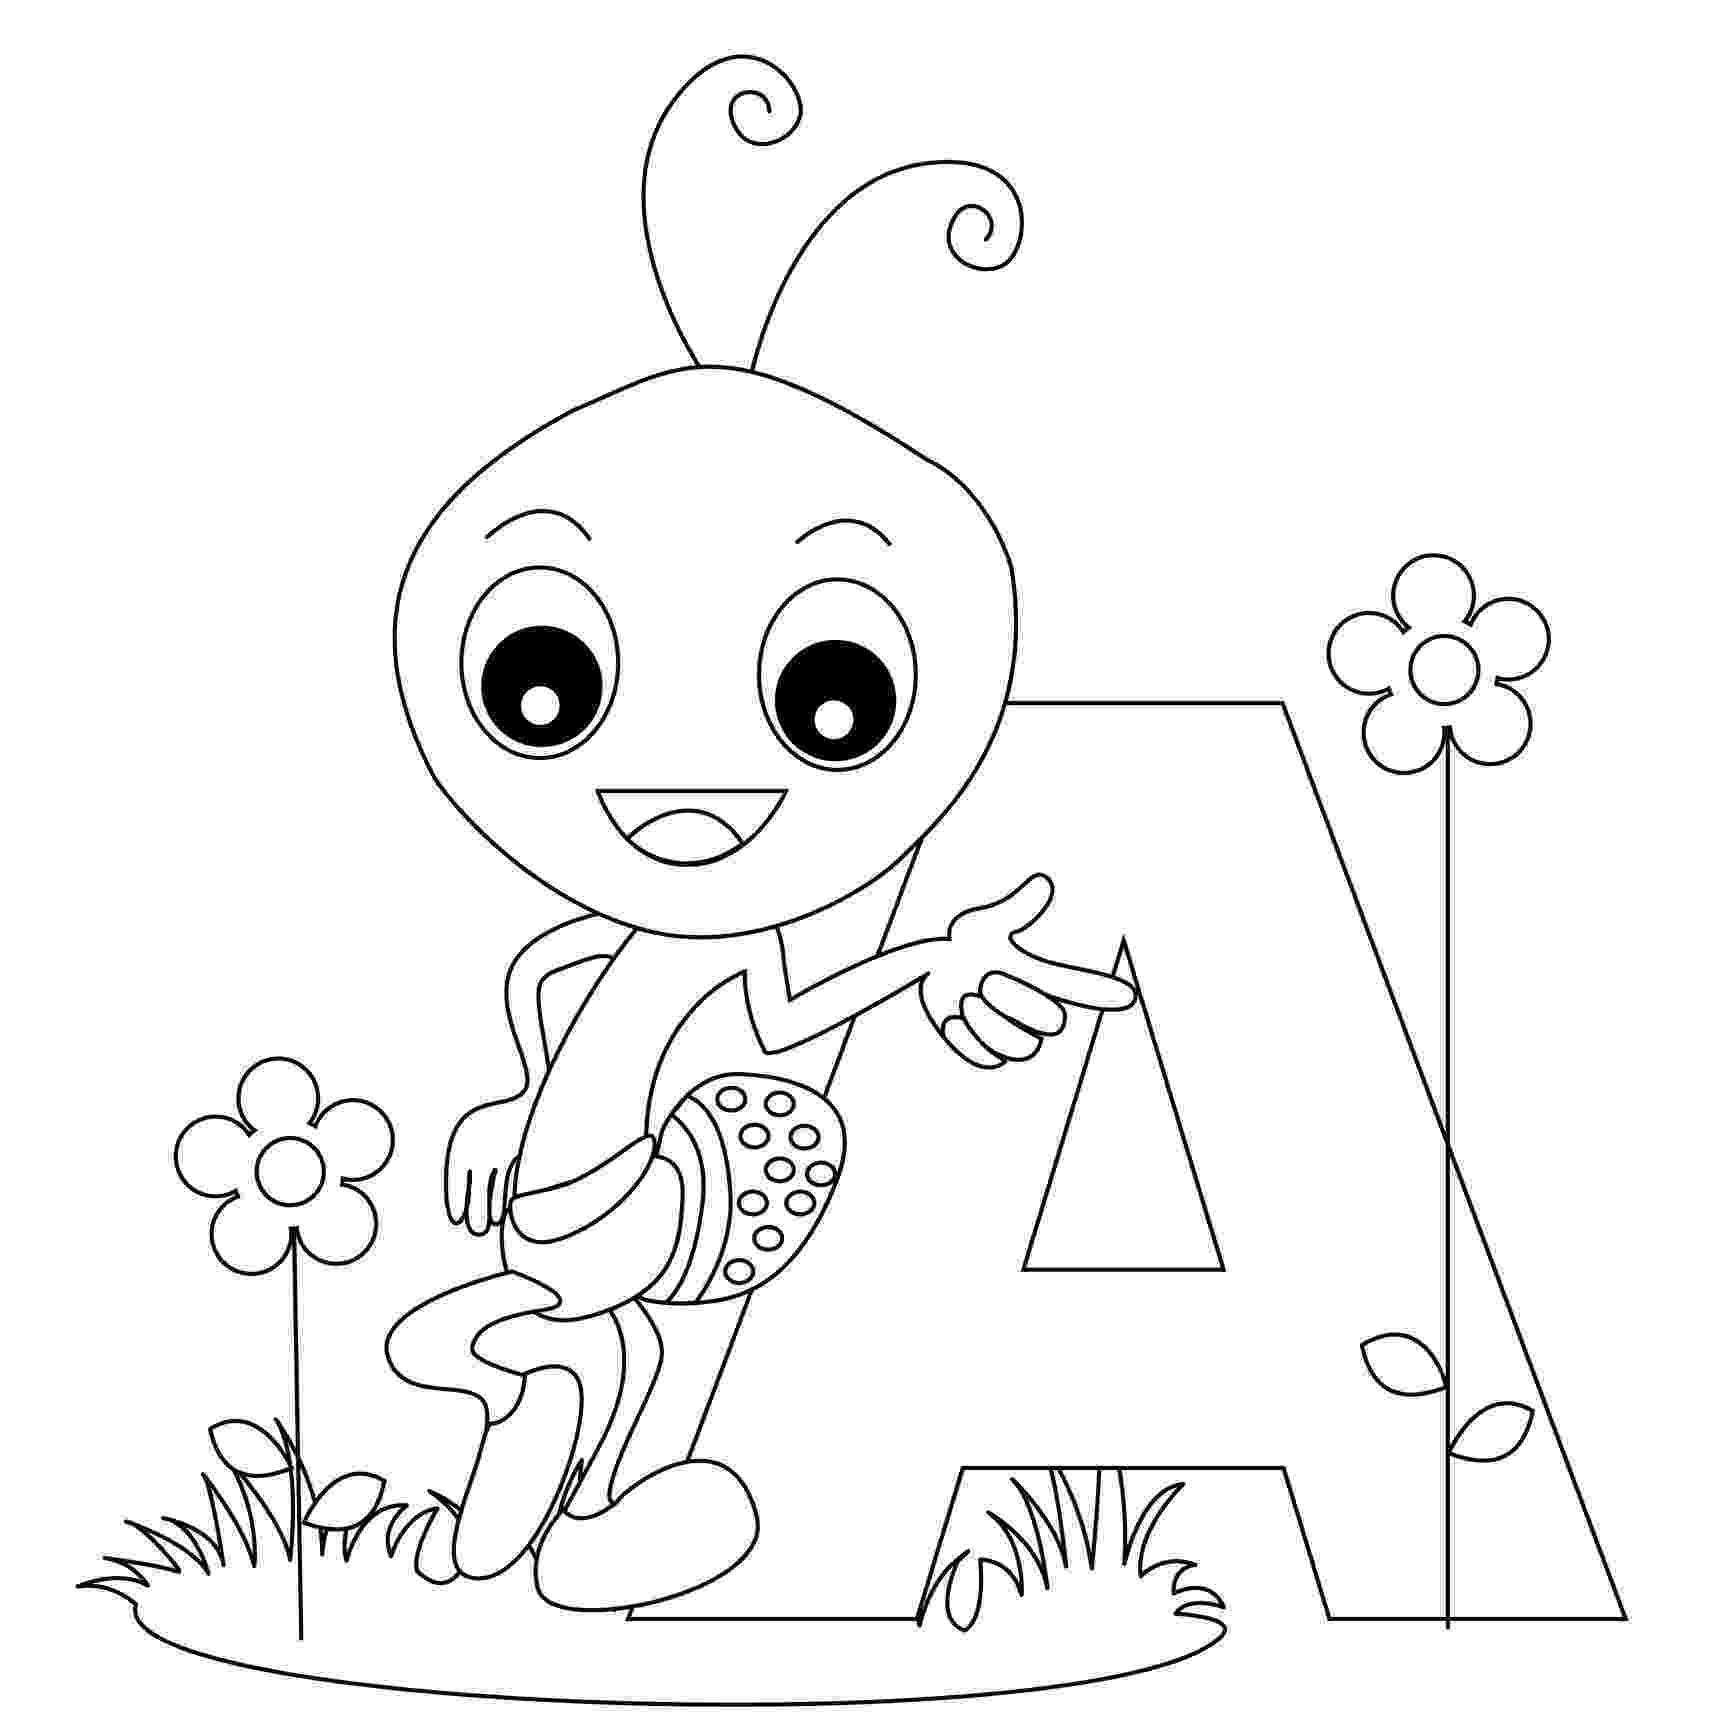 coloring book alphabet free printable alphabet coloring pages for kids best alphabet coloring book